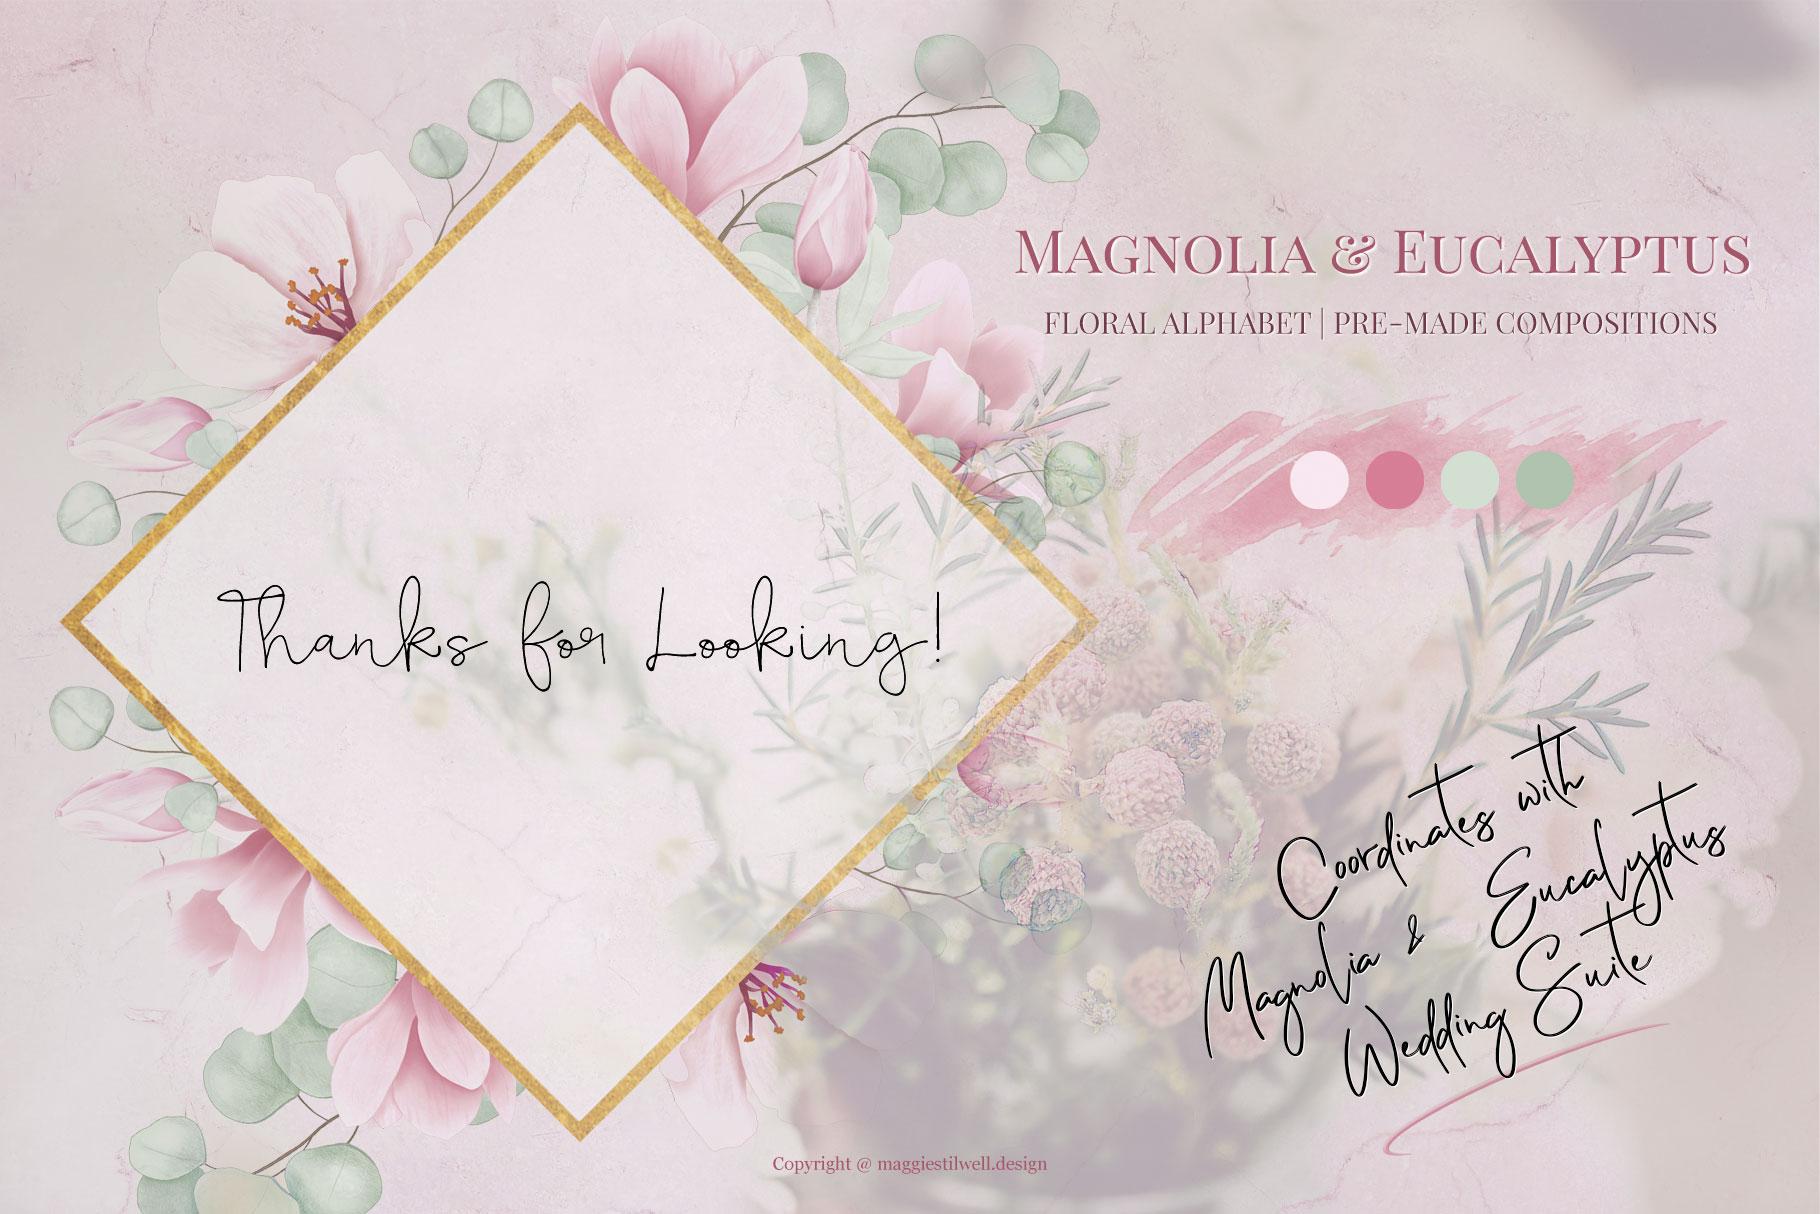 Magnolia & Eucalyptus Floral Alphabet example image 5